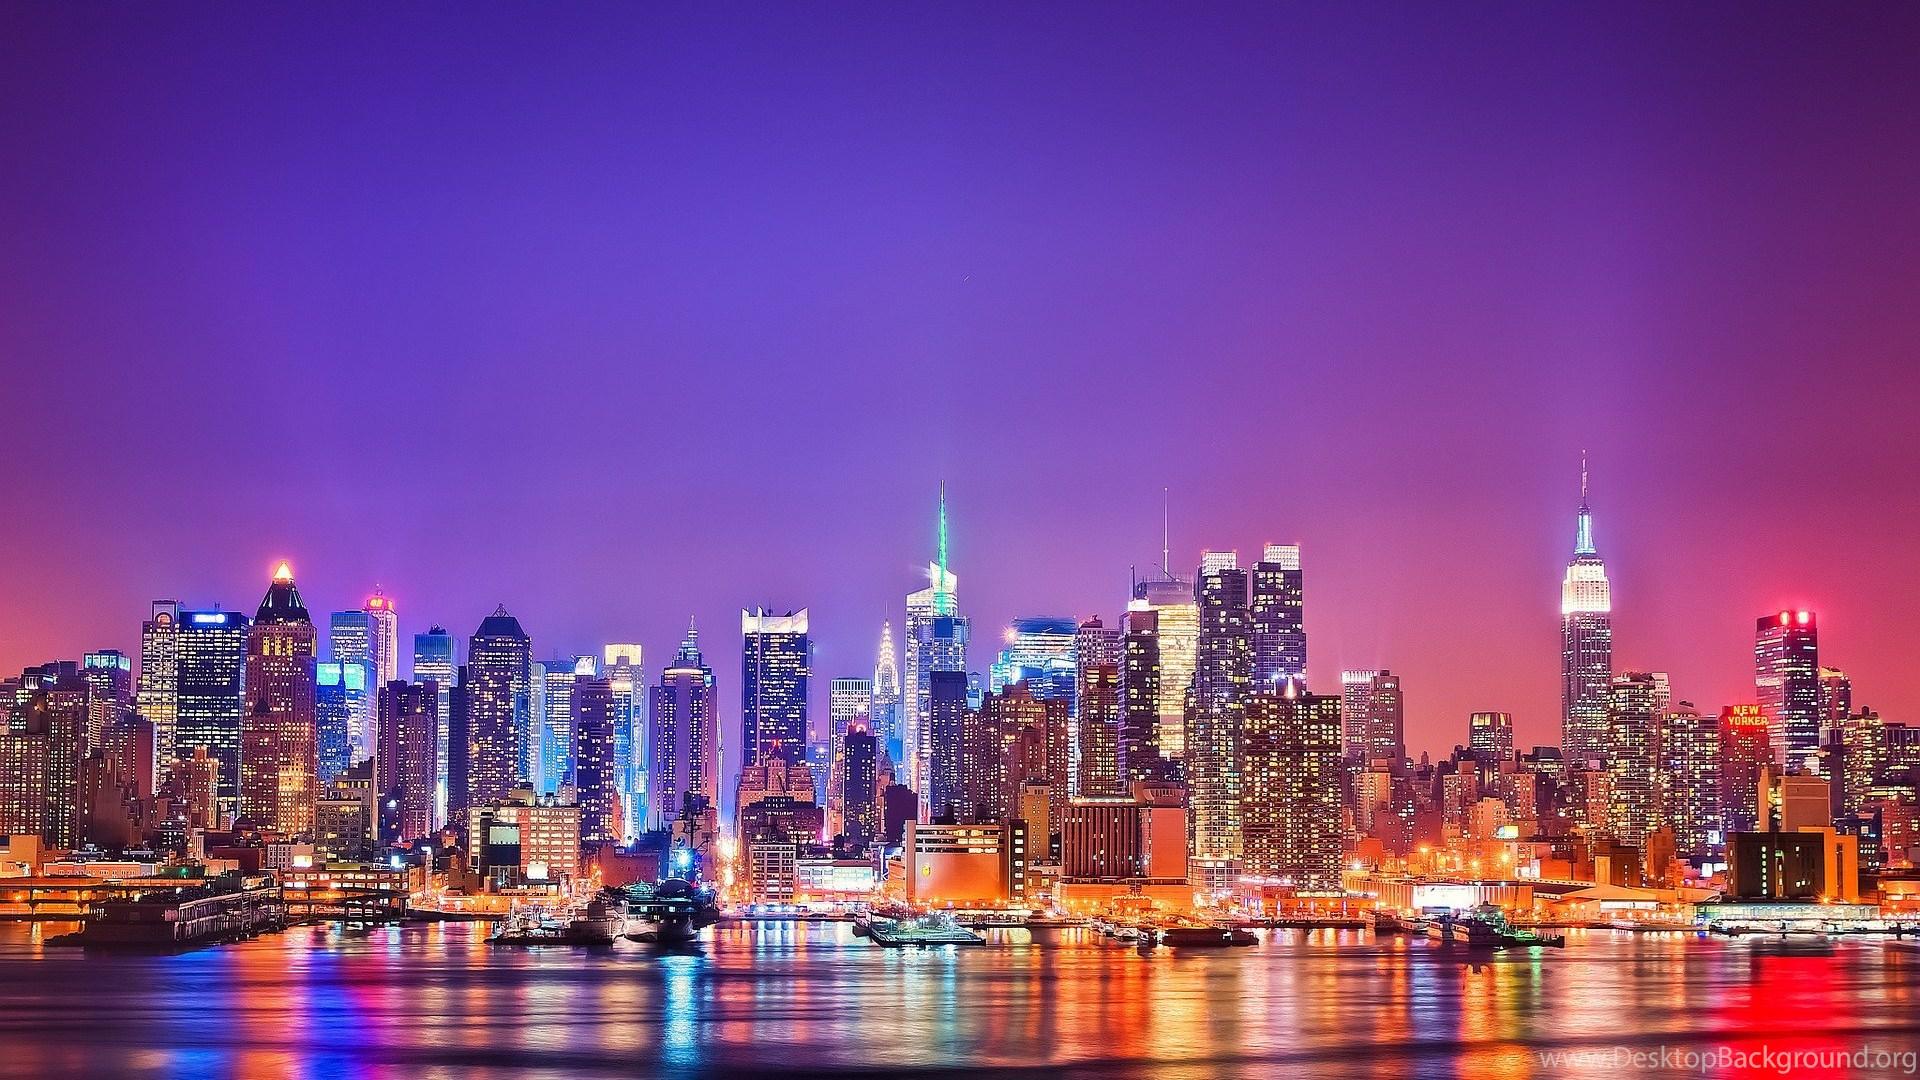 Download Free New York City Wallpapers Hd Desktop Background